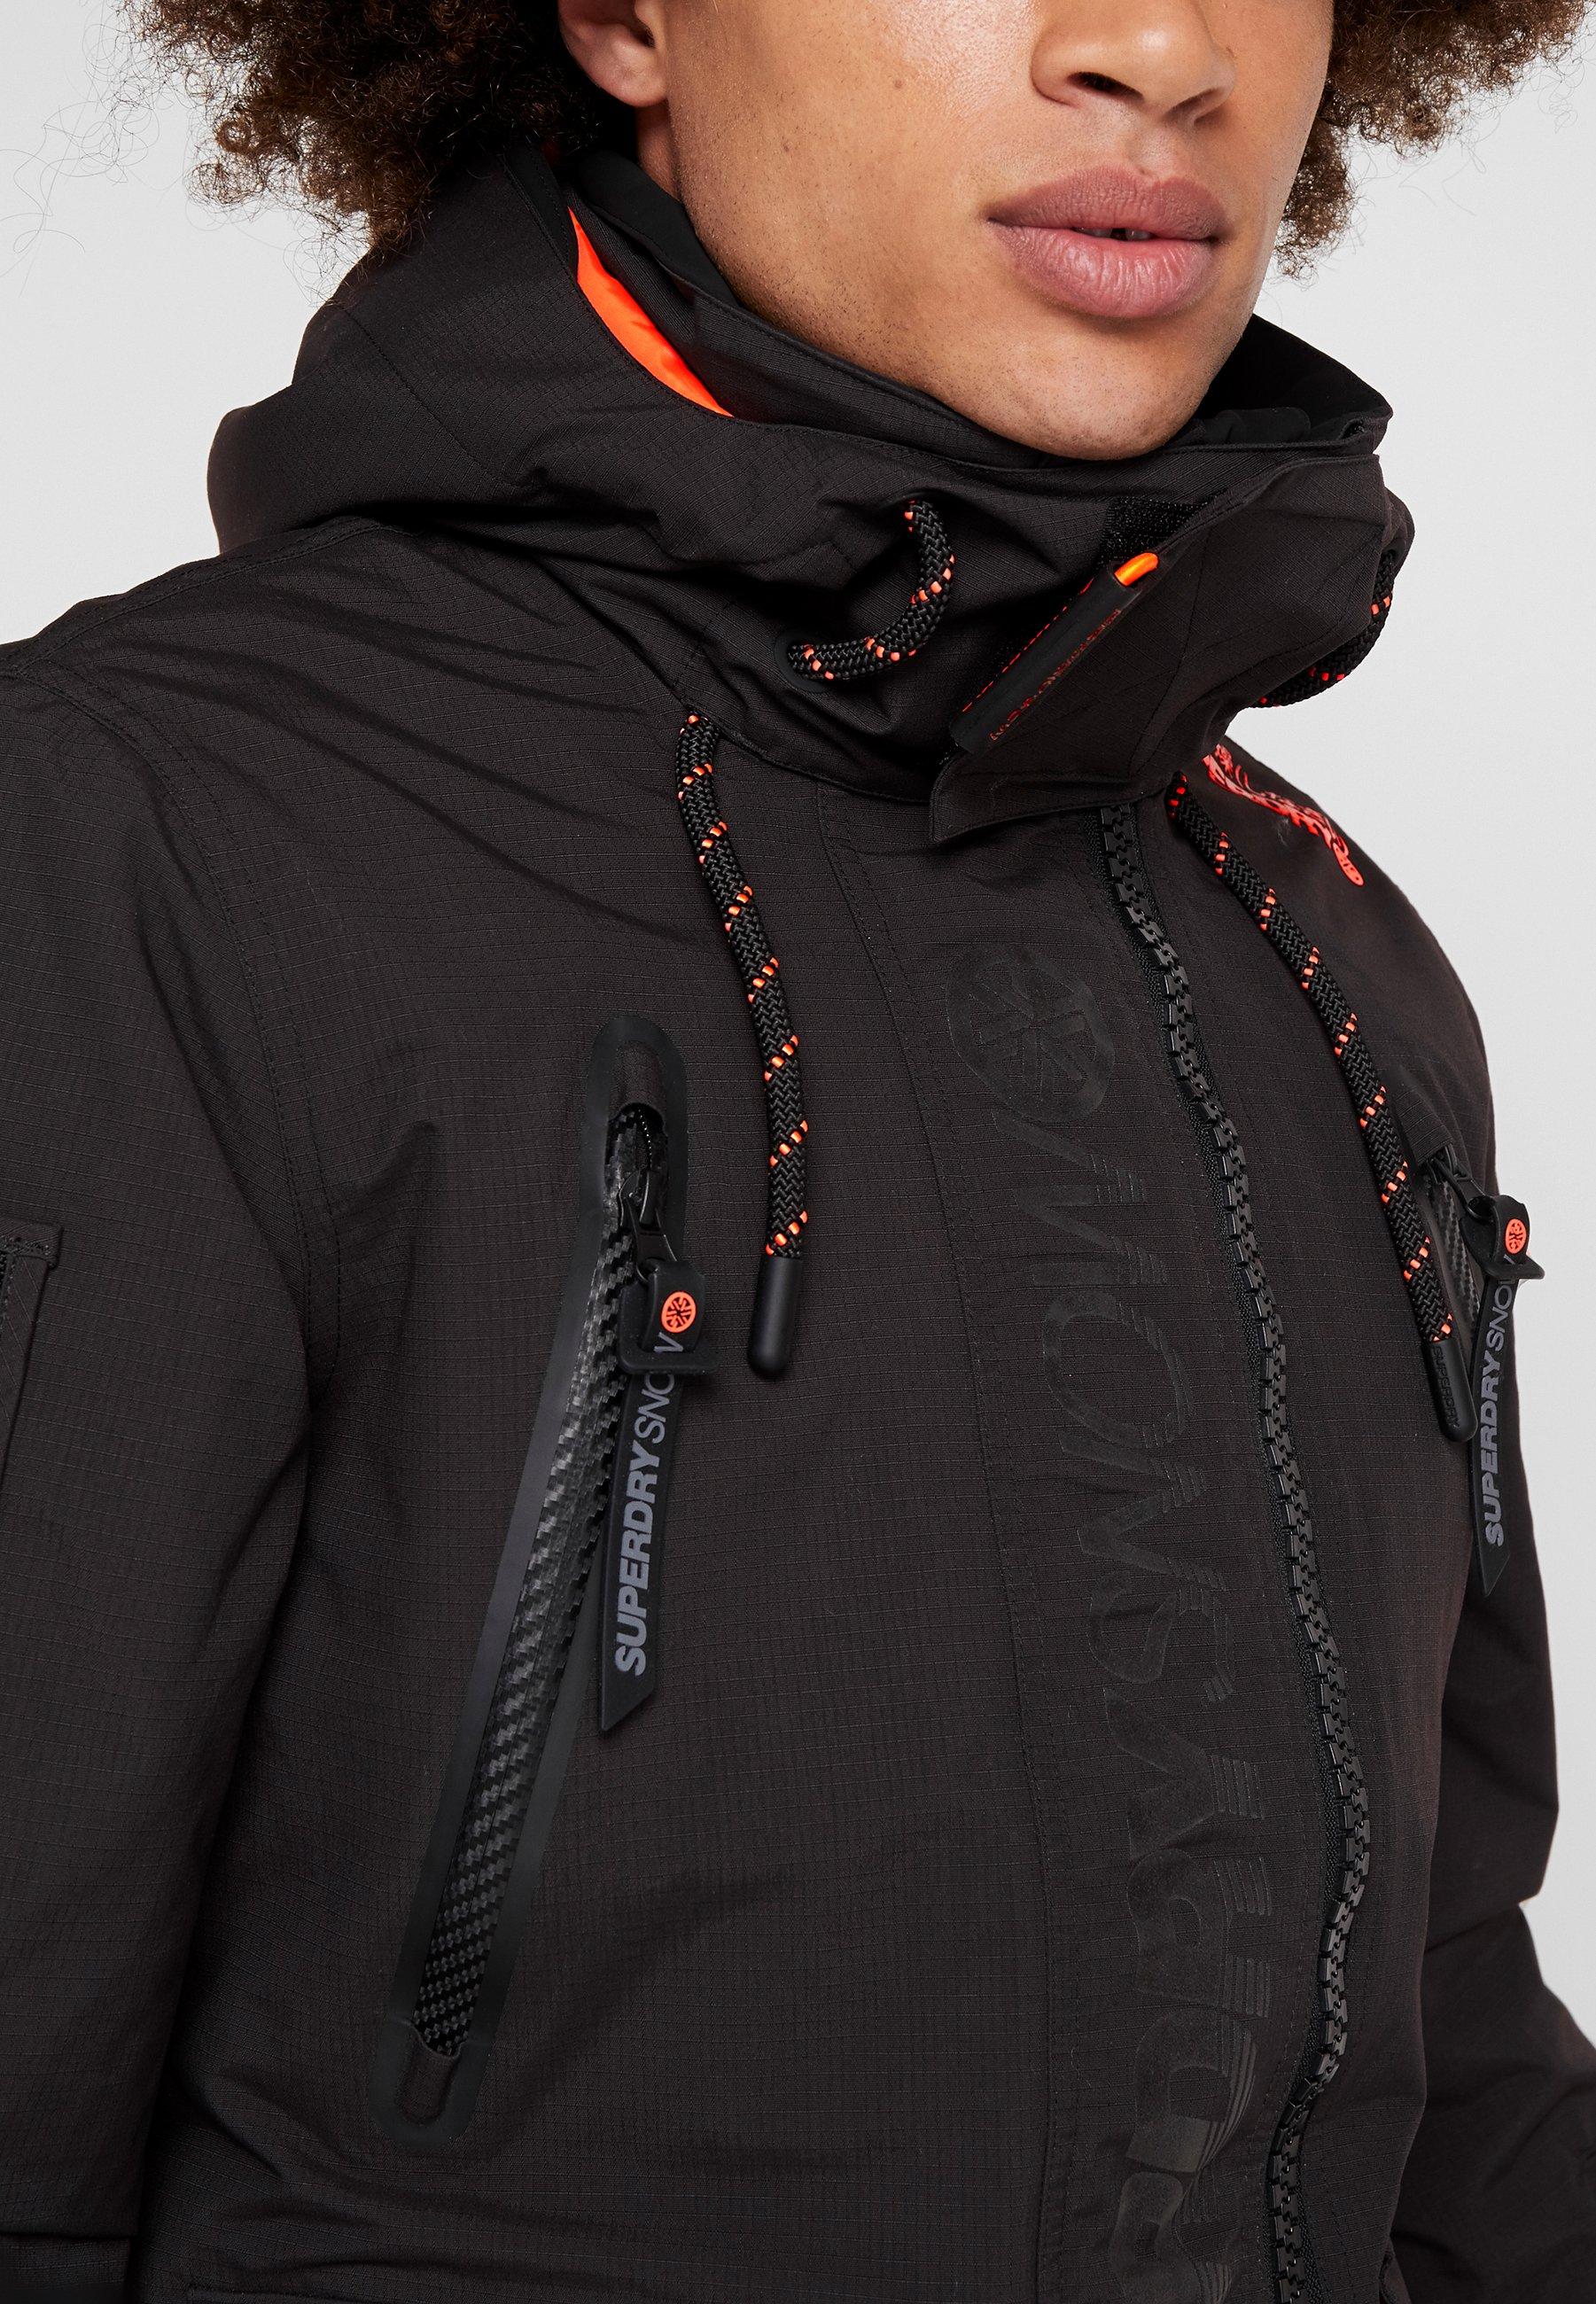 ULTIMATE SNOW RESCUE Veste de snowboard onyx black